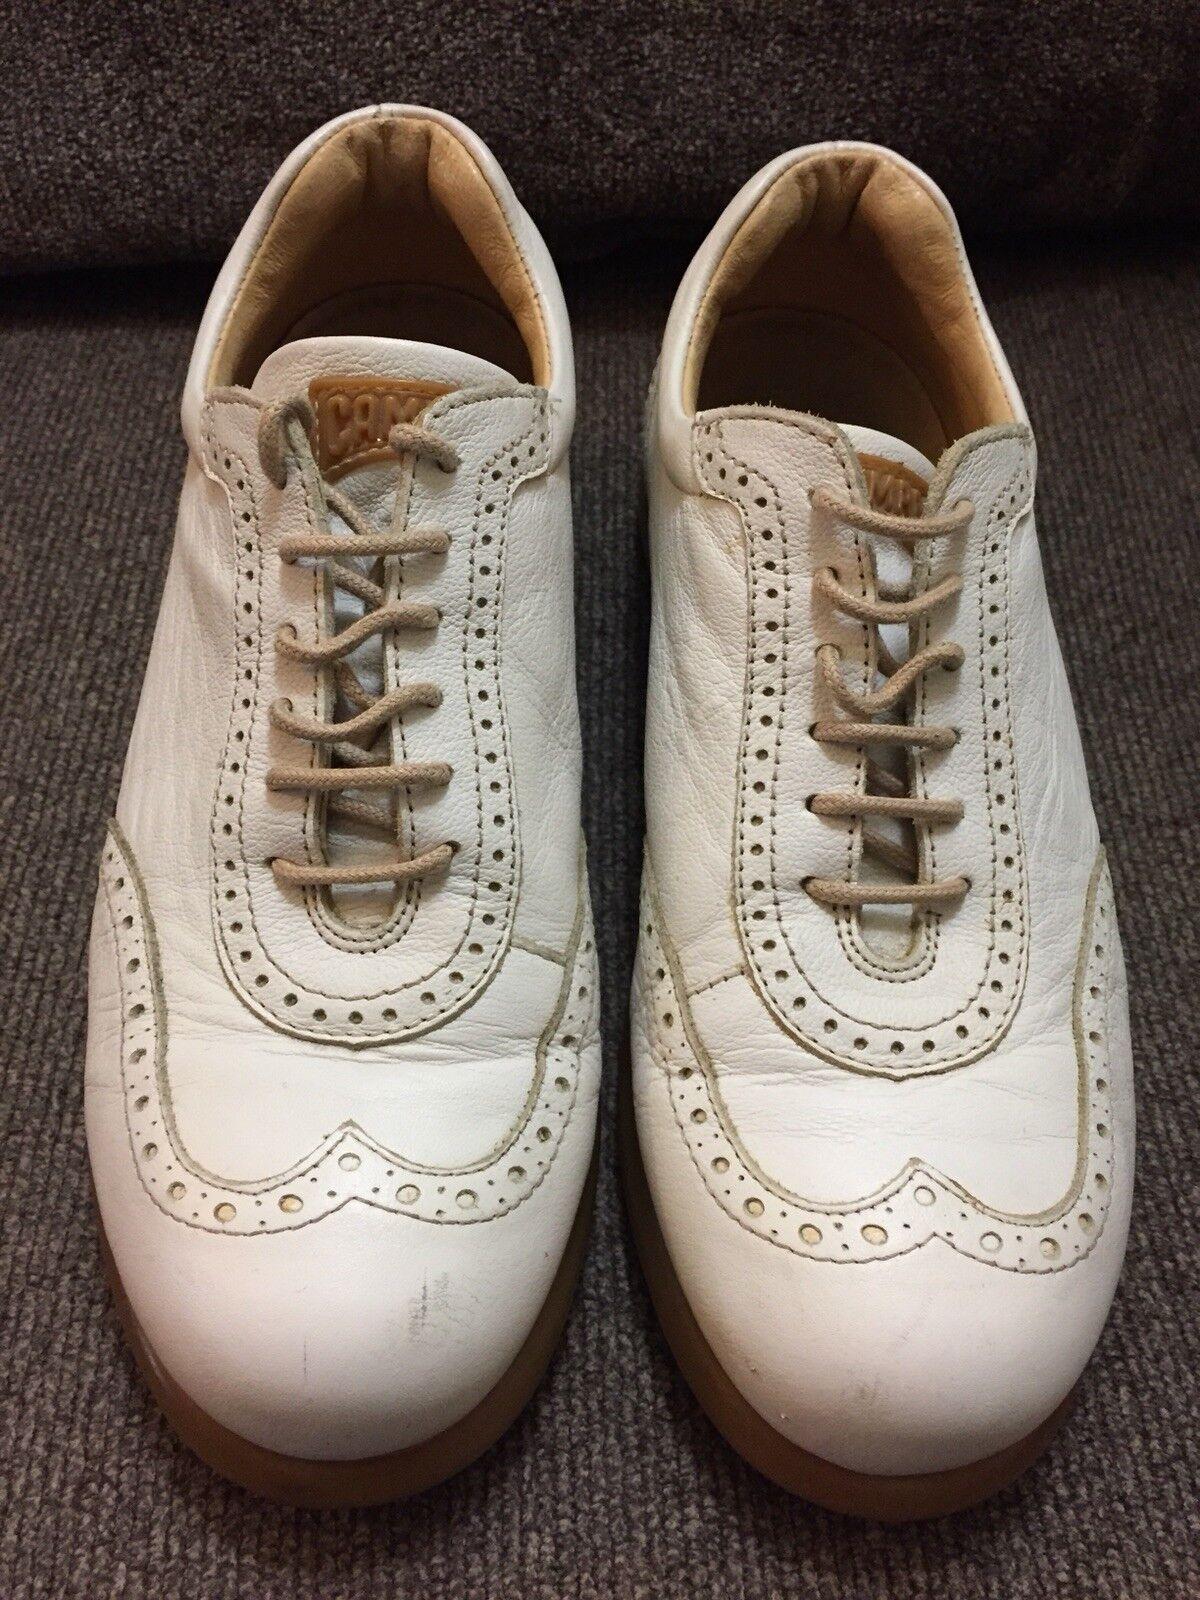 Camper 100% Damens Off Weiß Lace Up Up Up Wingtip Schuhes Größe 38 Us 7 6c8f02